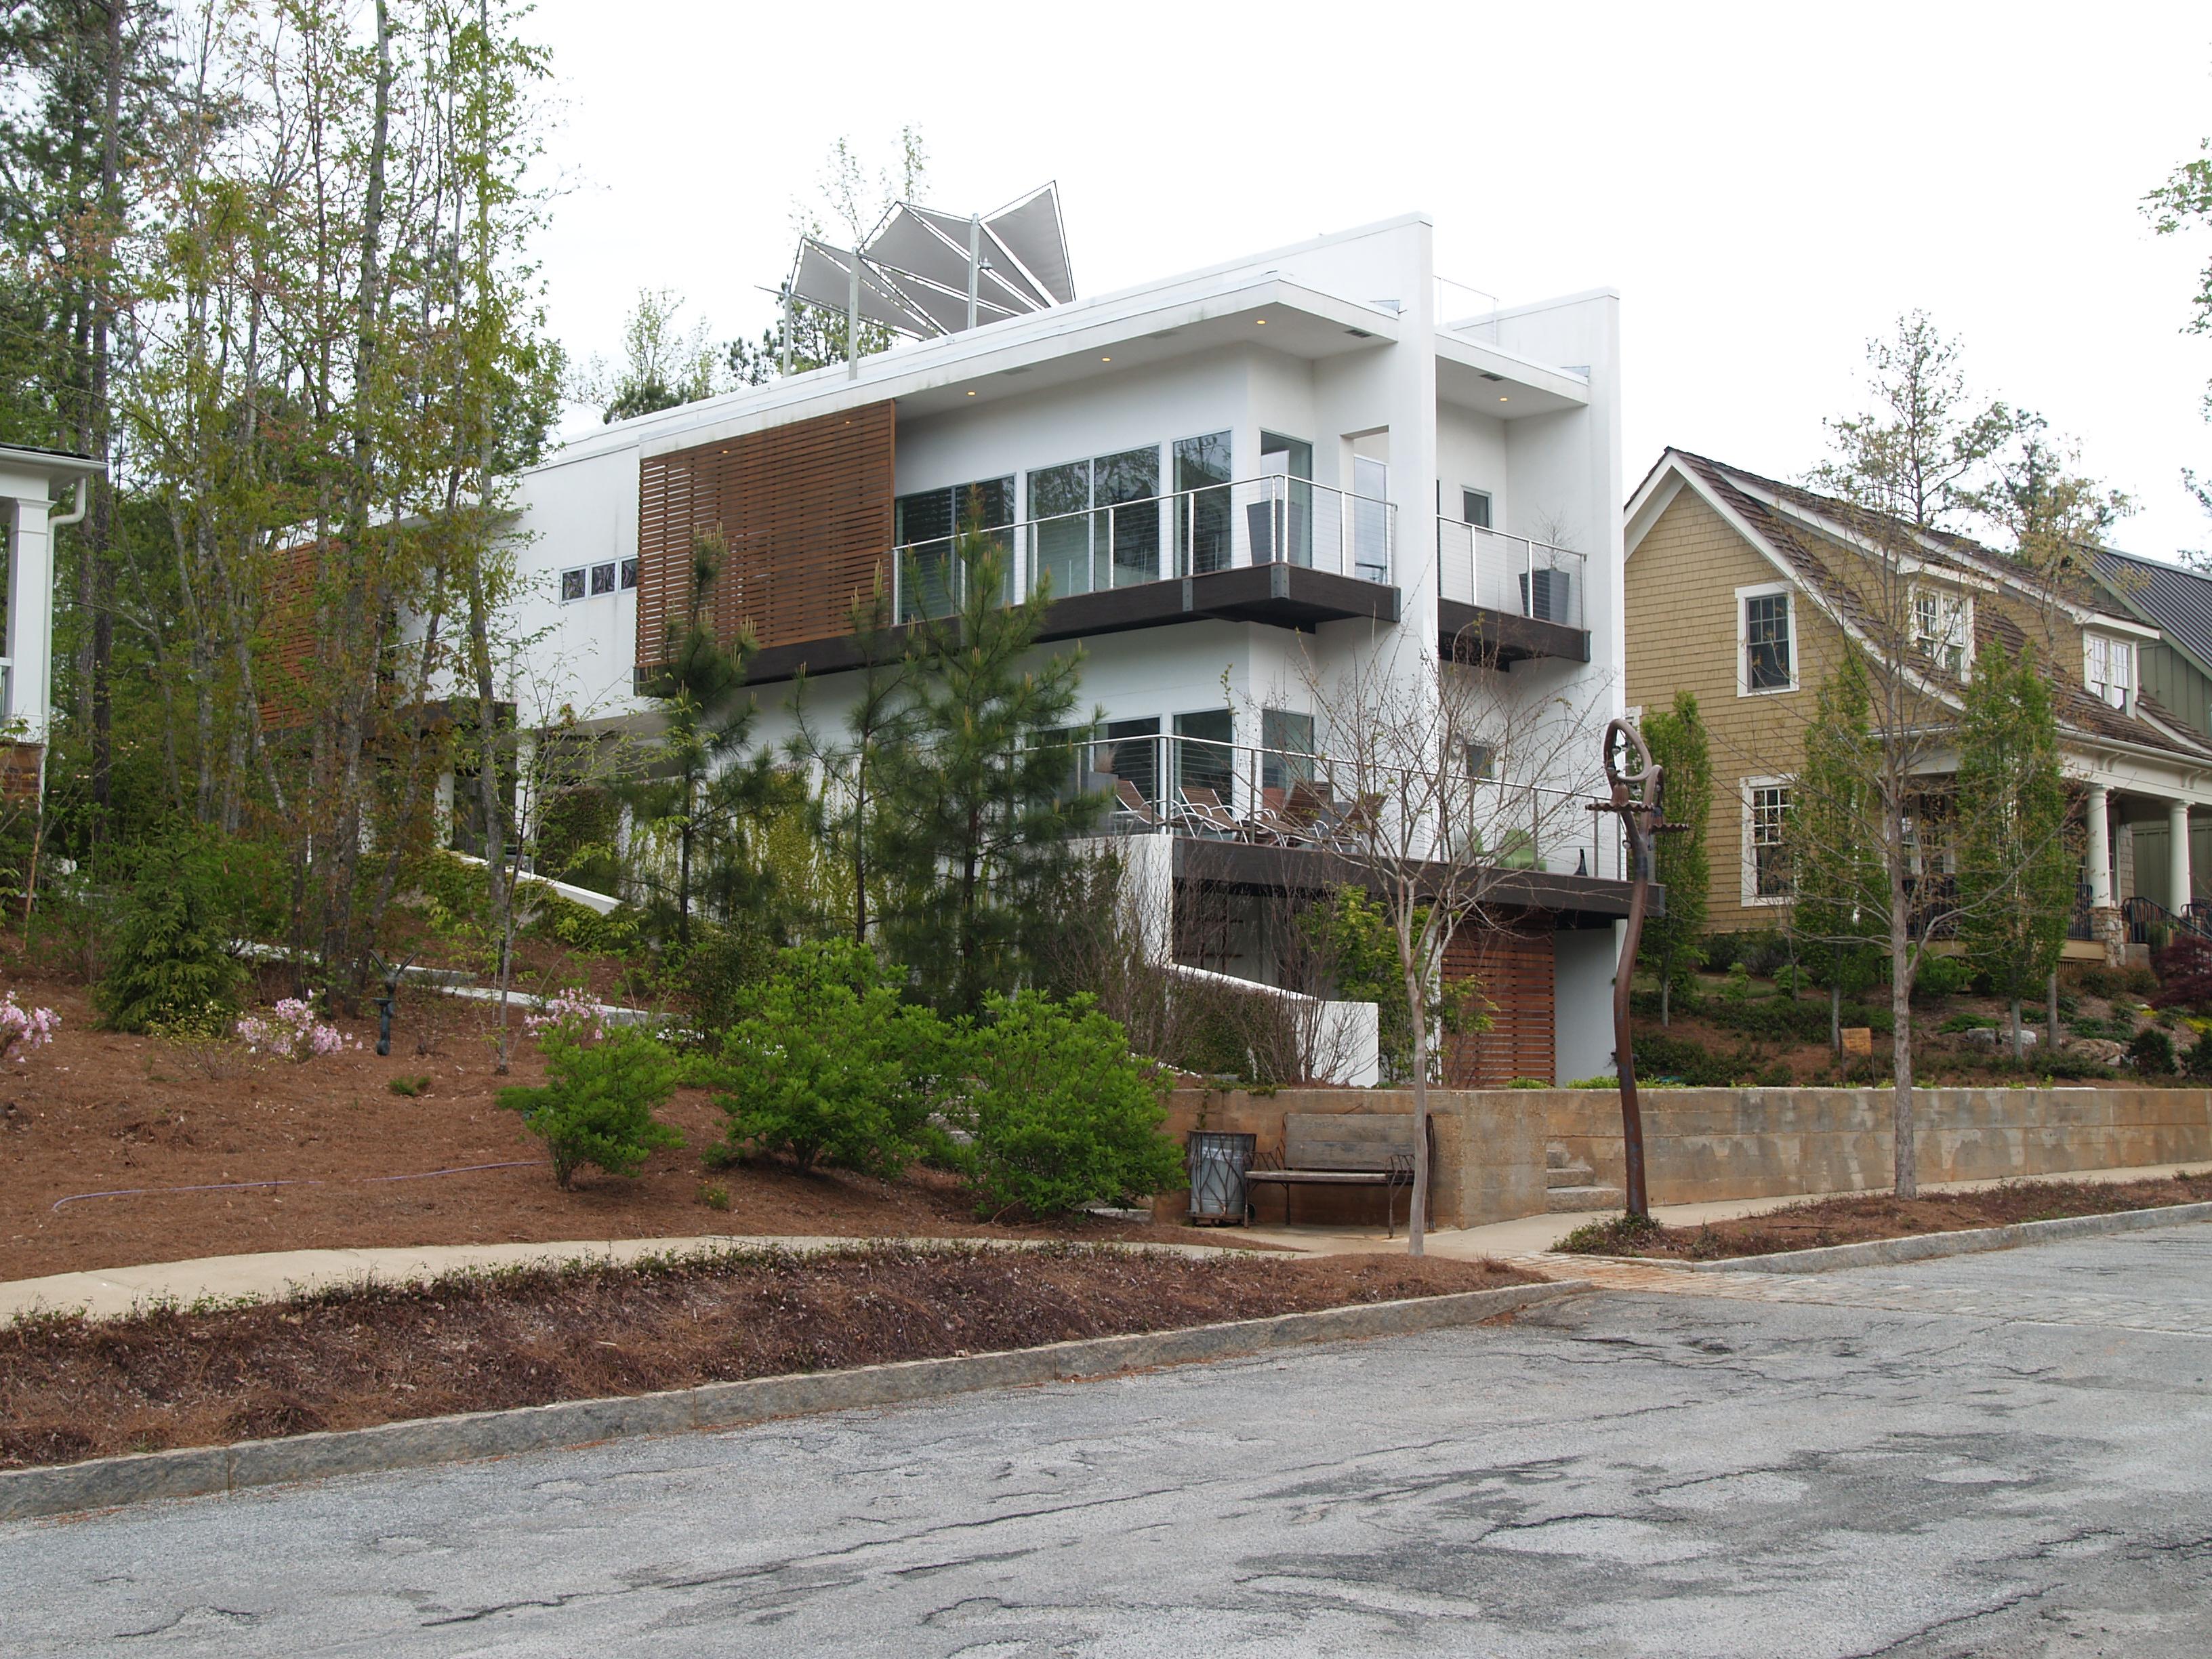 Serenbe – 25 miles southwest of the Atlanta aiport | urbanexus